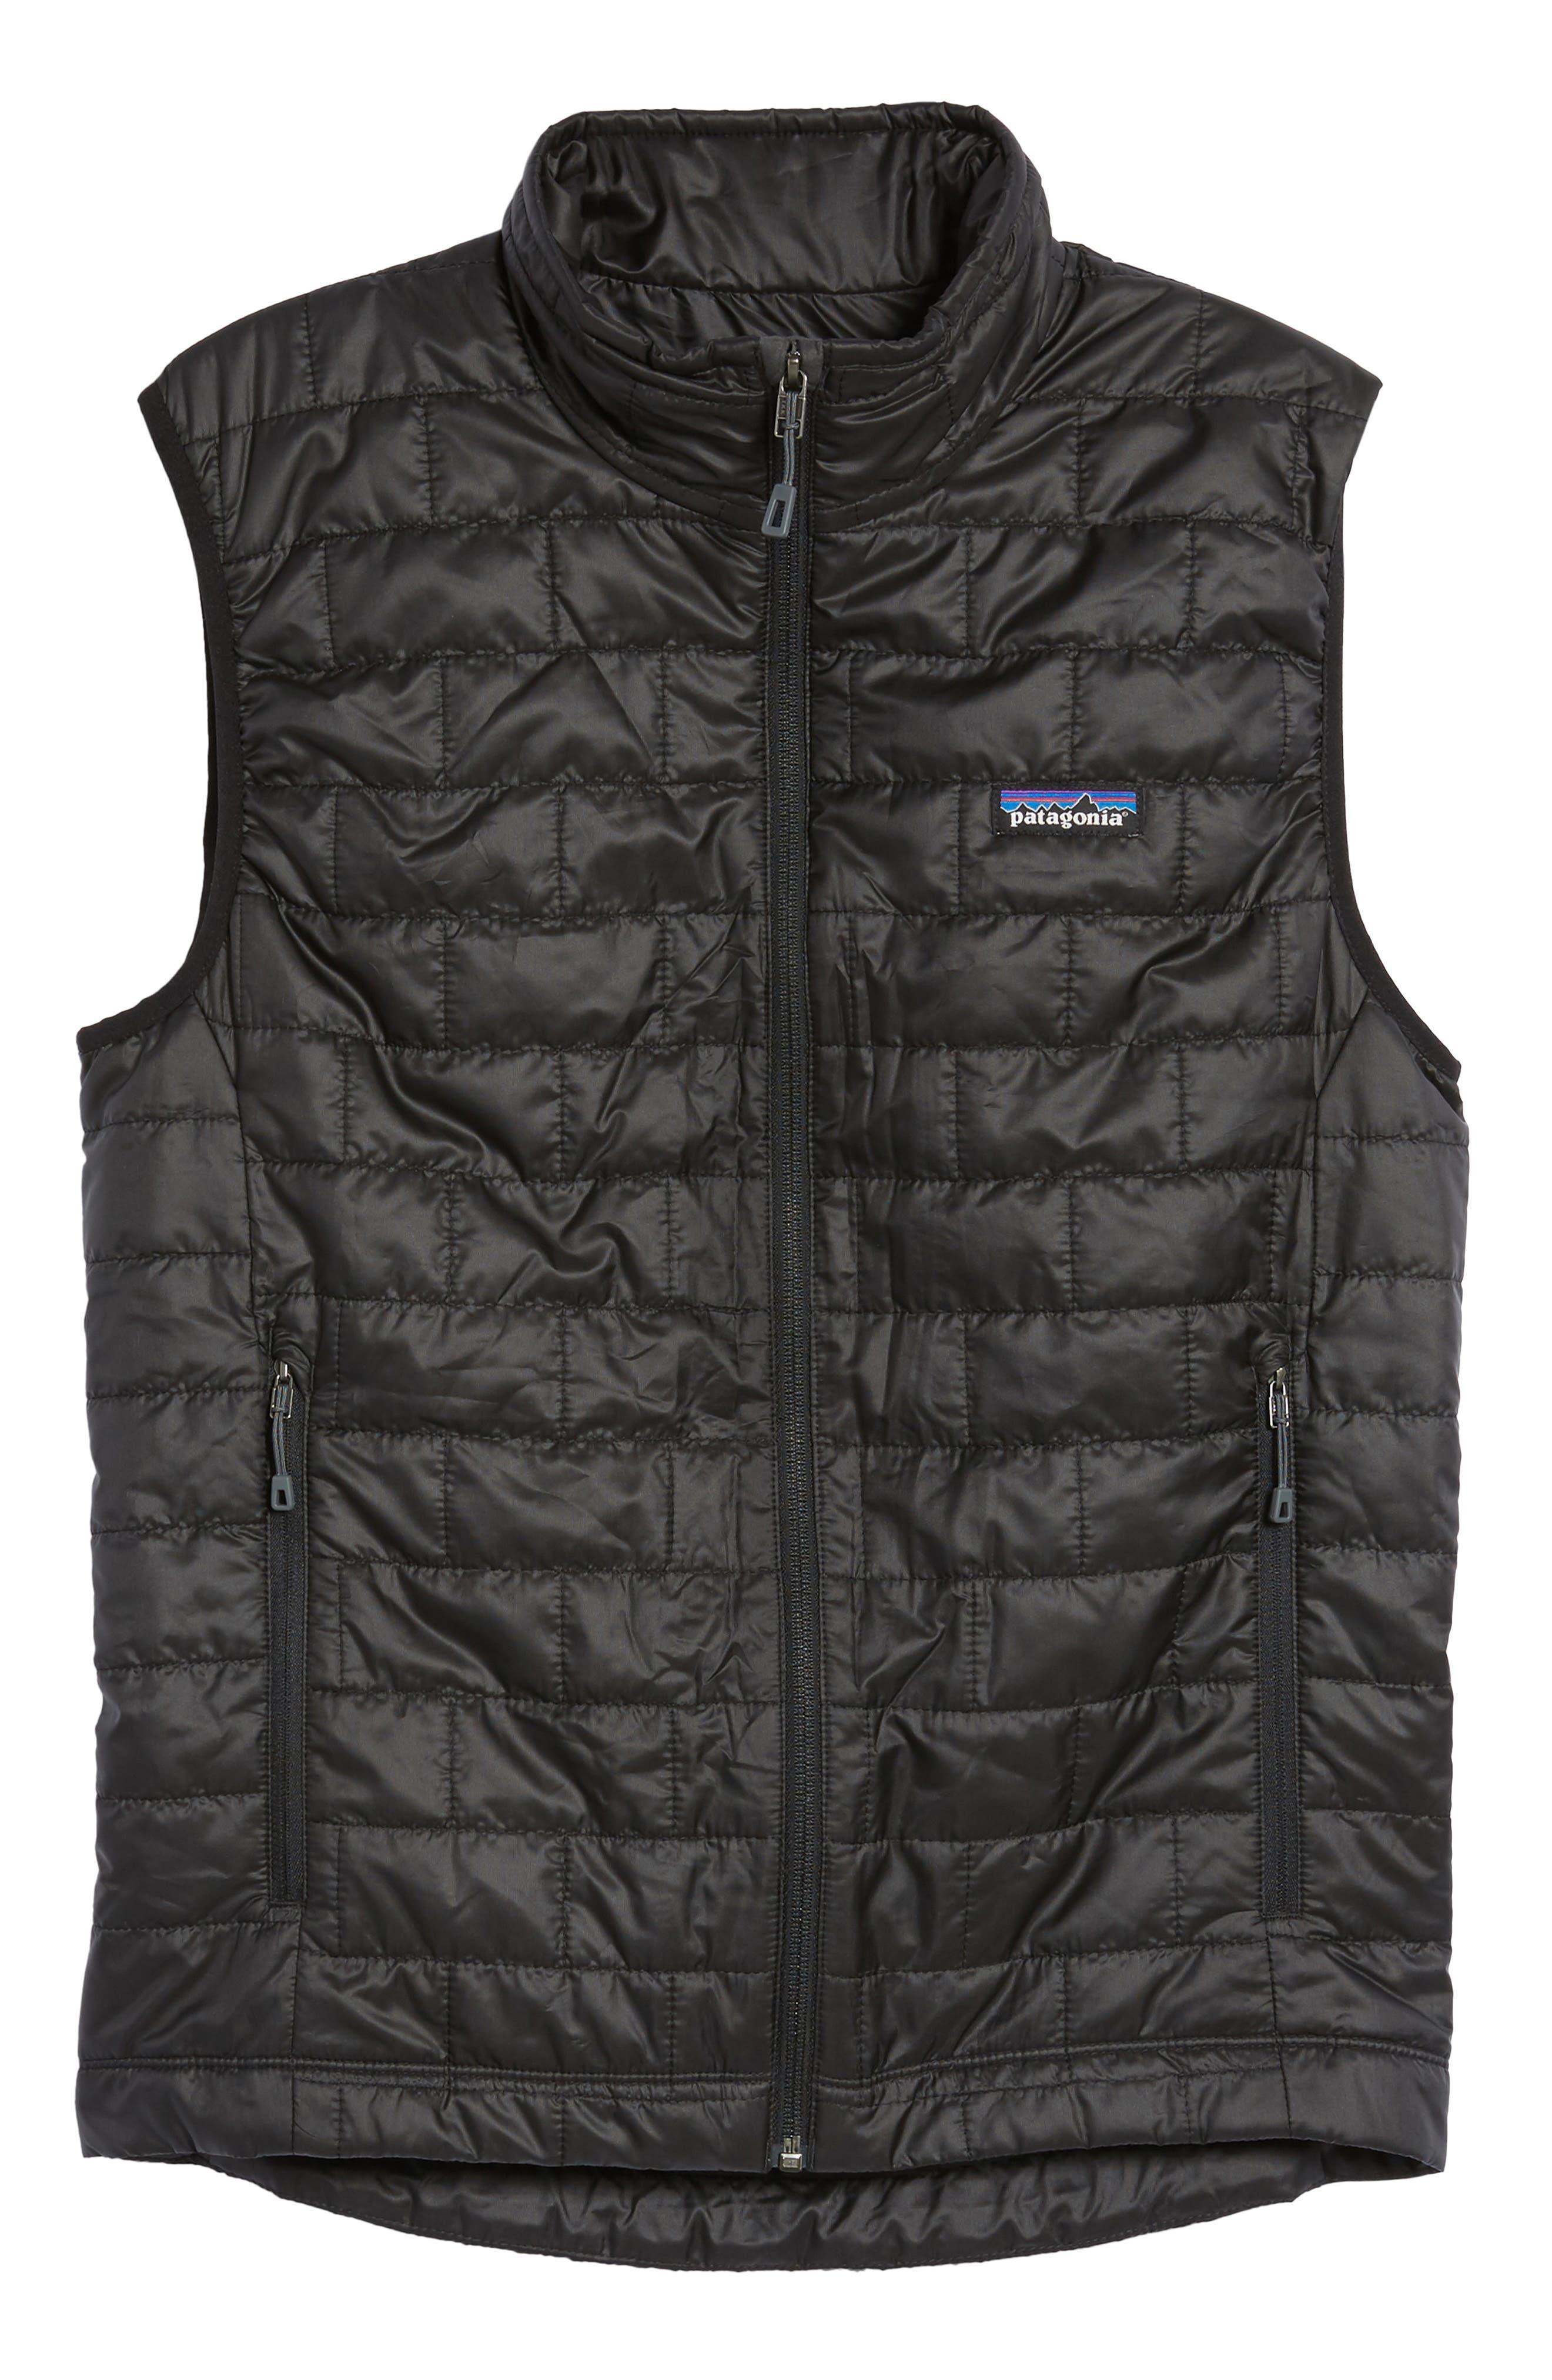 Nano Puff<sup>®</sup> Vest,                             Alternate thumbnail 6, color,                             Black